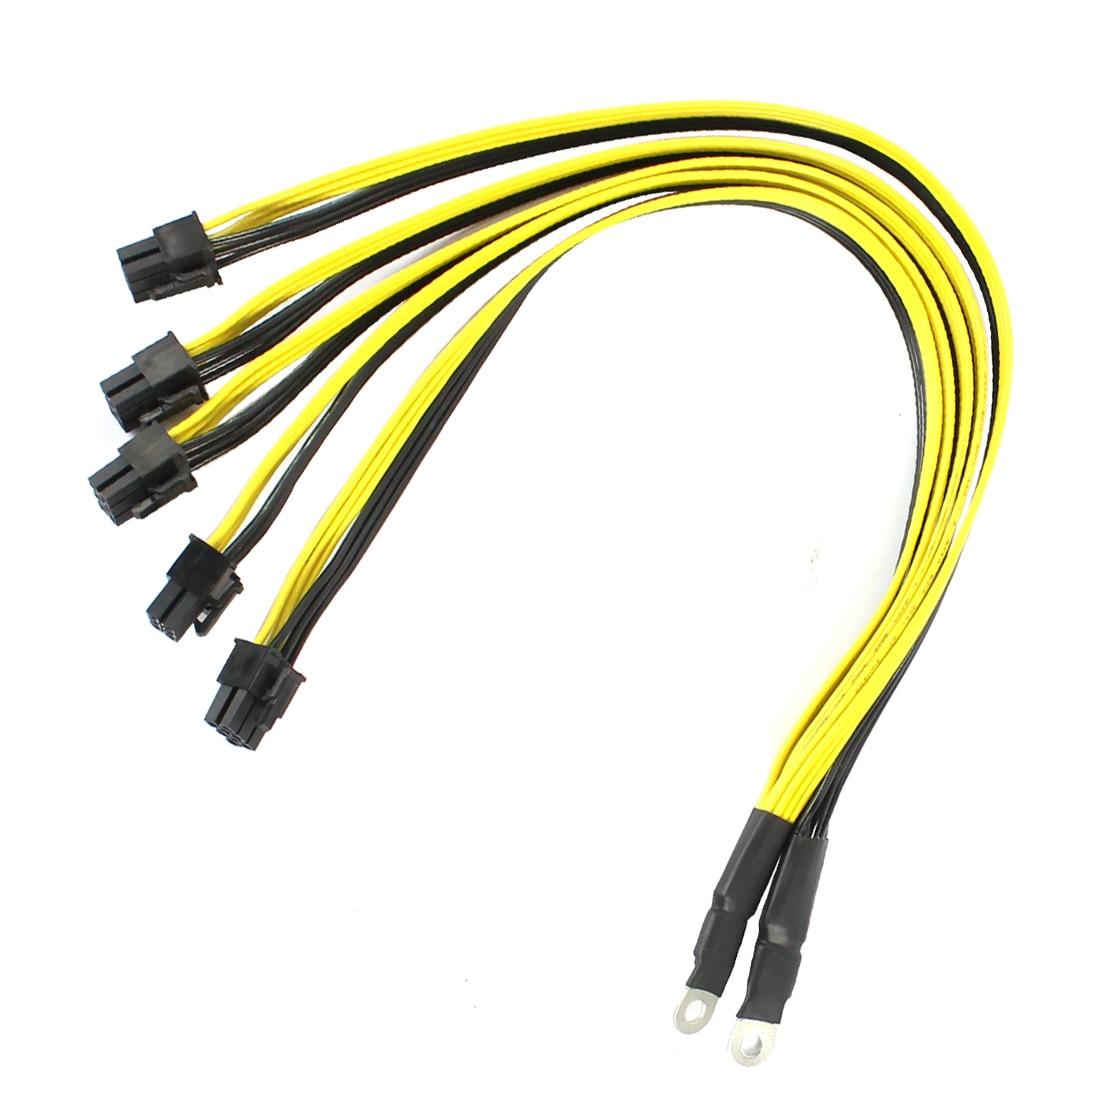 2pcs S7 S9 To 5X PCI-E PCIe 6Pin GPU Graphics Card Splitter Power Cable BTC Miner Bitcoin Litecoin S11 T9+ X10 L3+ A3 A841 M3 P3